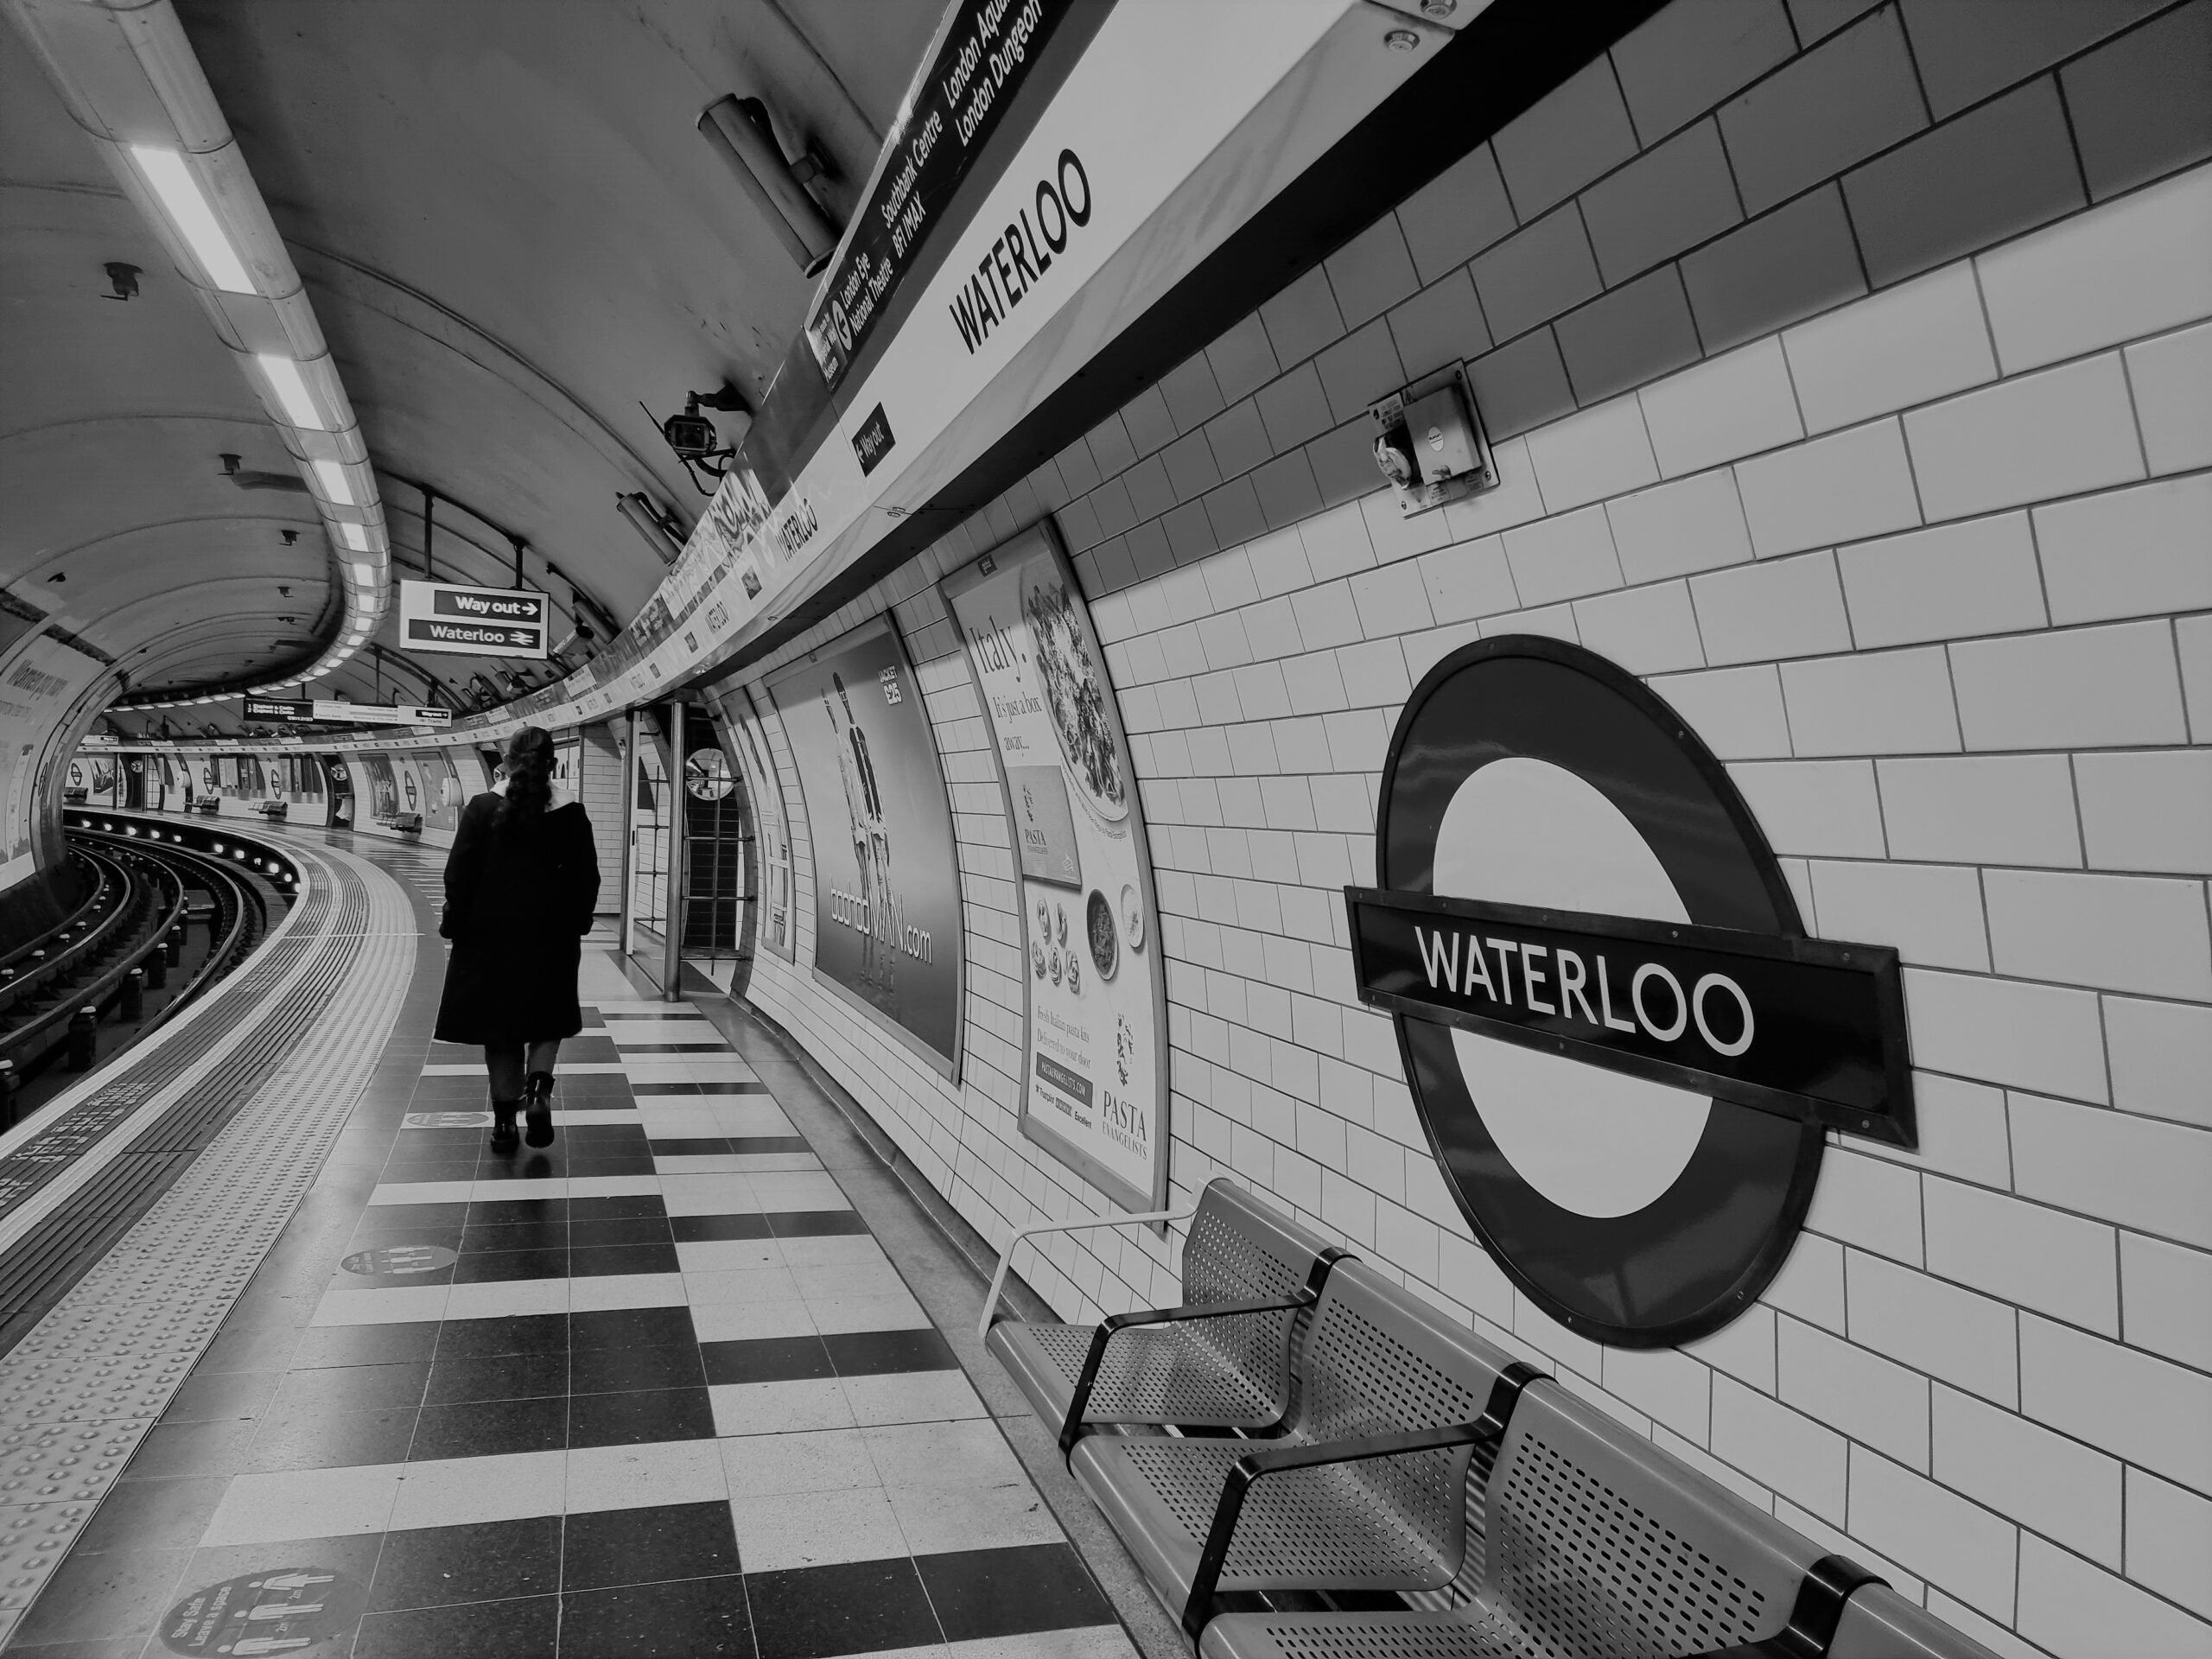 London Underground, by Thanu